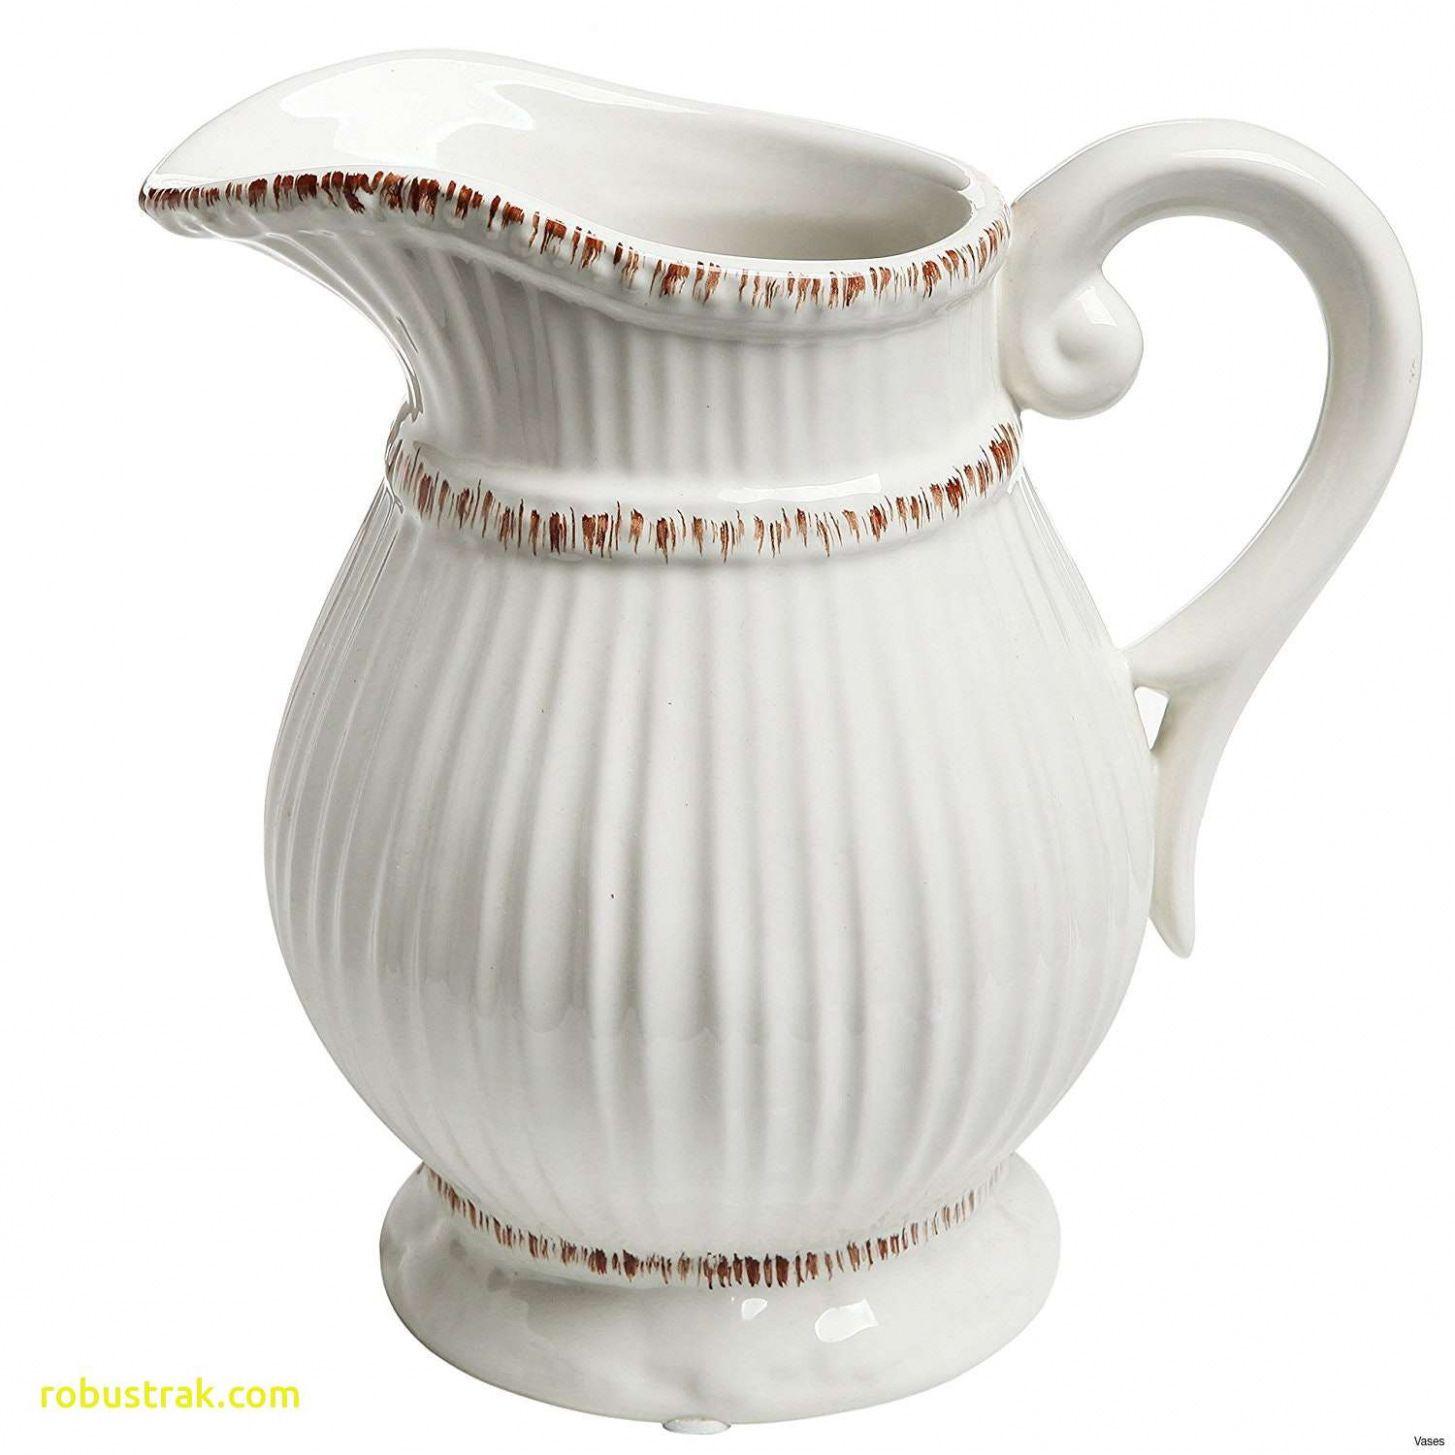 lenox small vase of 26 lenox small vase the weekly world with regard to 26 lenox small vase